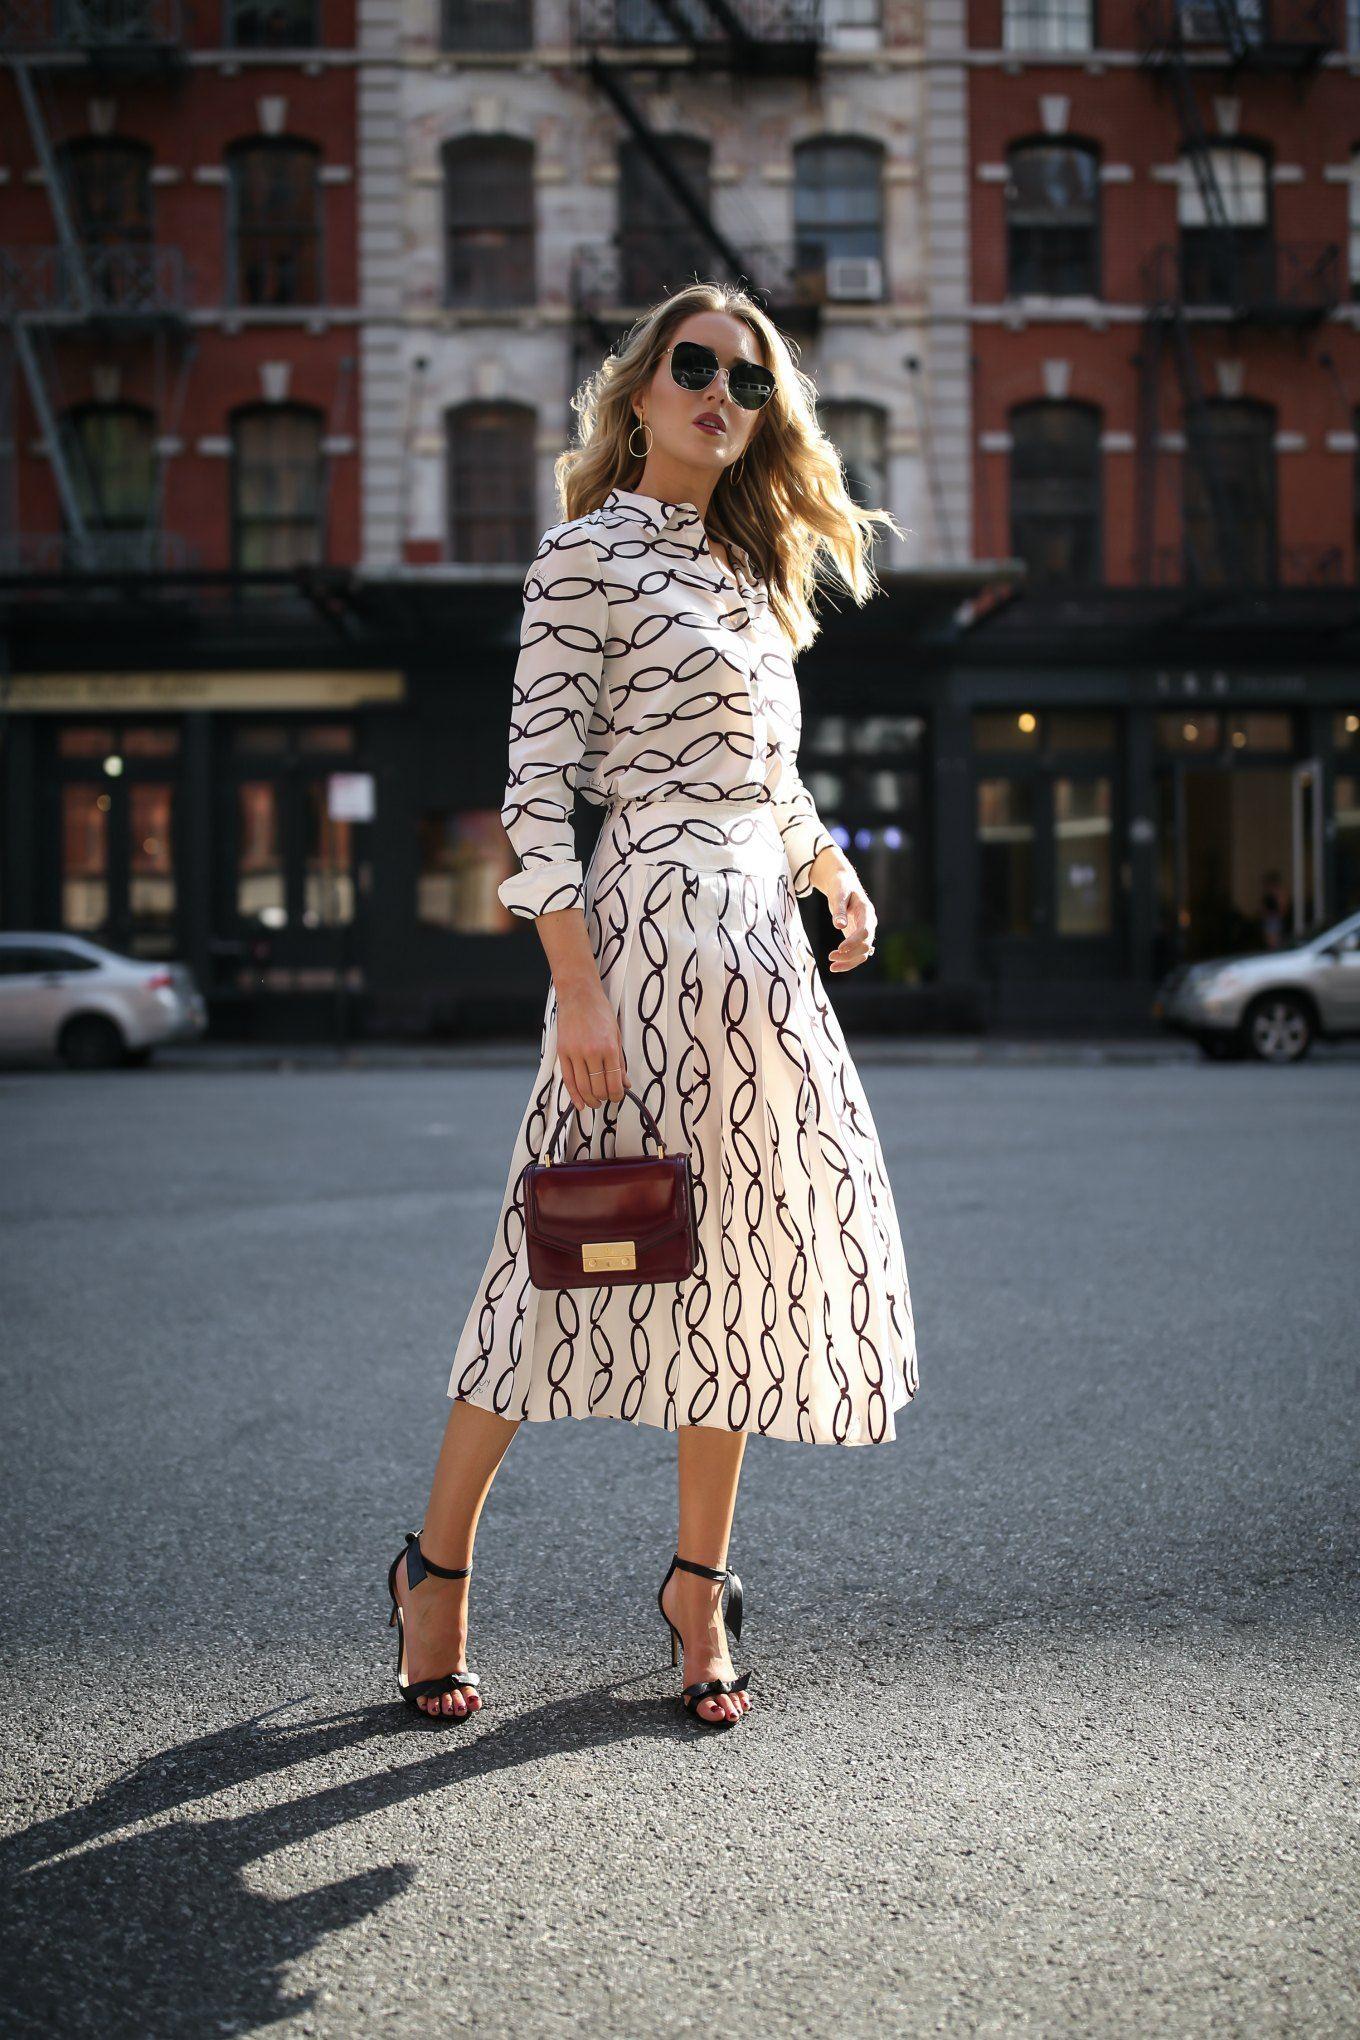 Burgundy Tory Burch Juliette Bag Black And White Pleated Midi Skirt